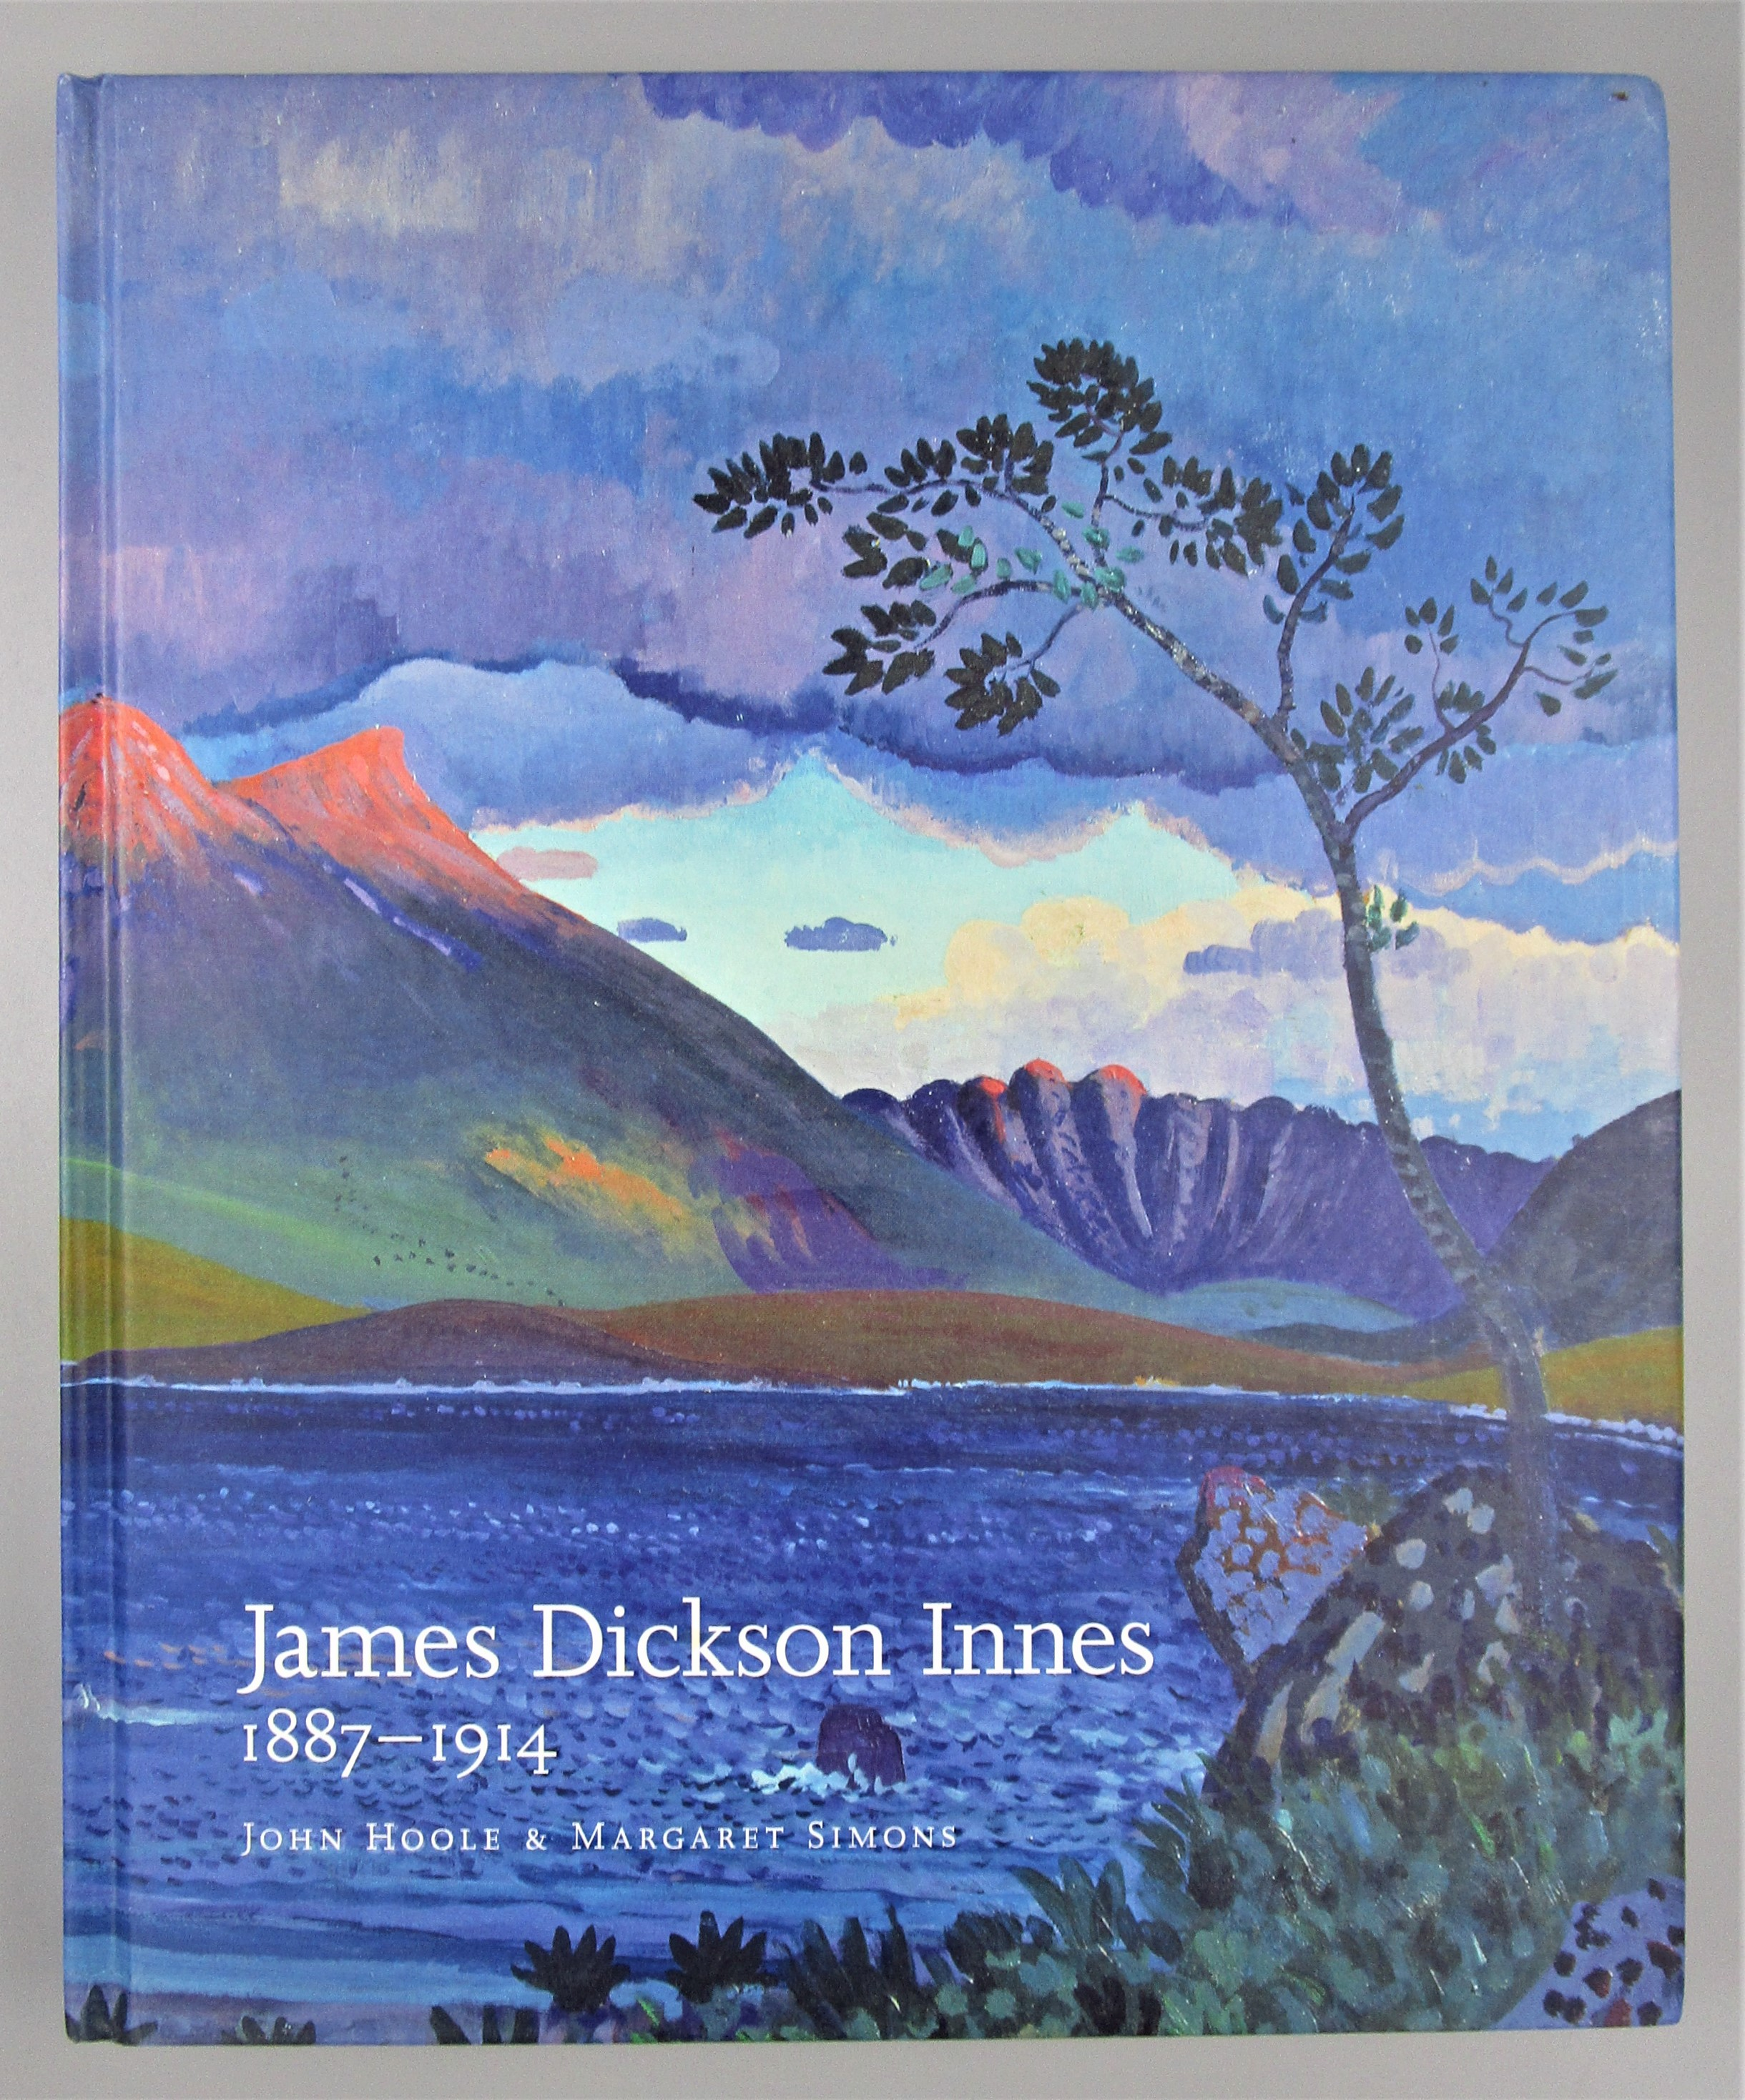 JAMES DICKSON INNES, by J. Hoole & M. Simons - 2013